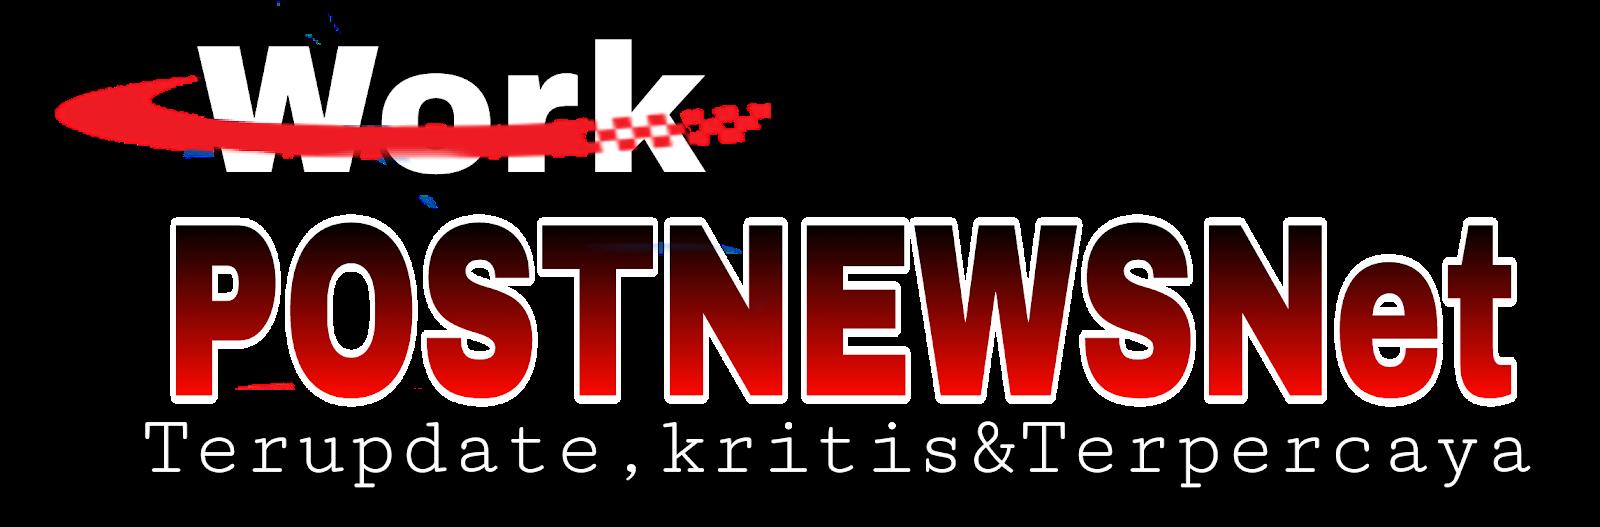 POSTNEWS NETWORK